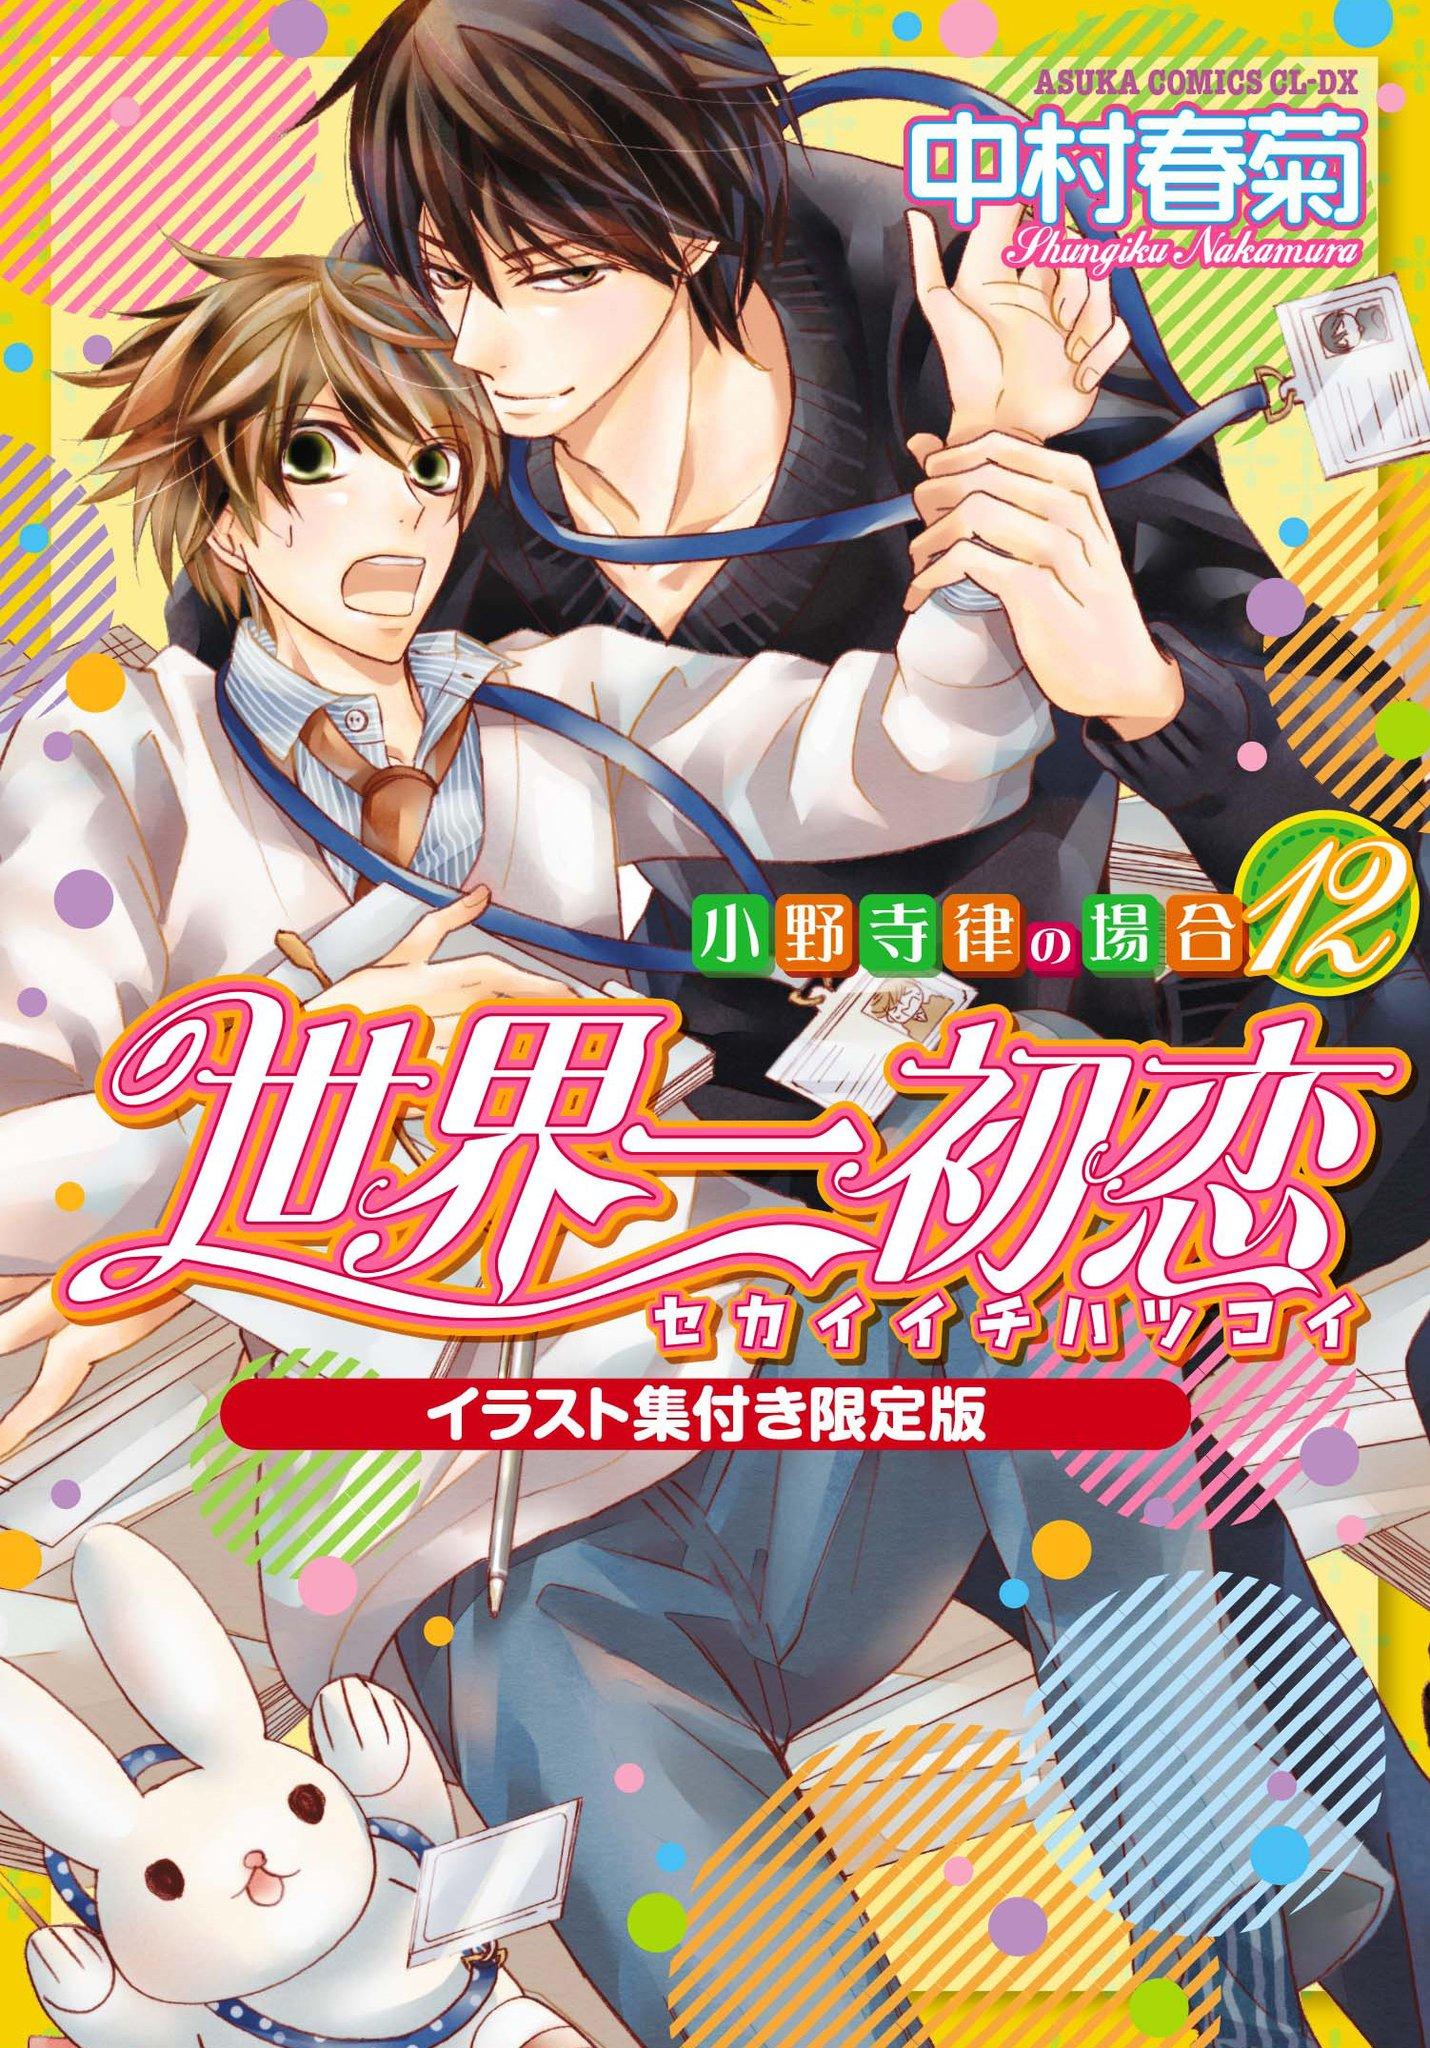 sekaiichi hatsukoi manga descargar ares